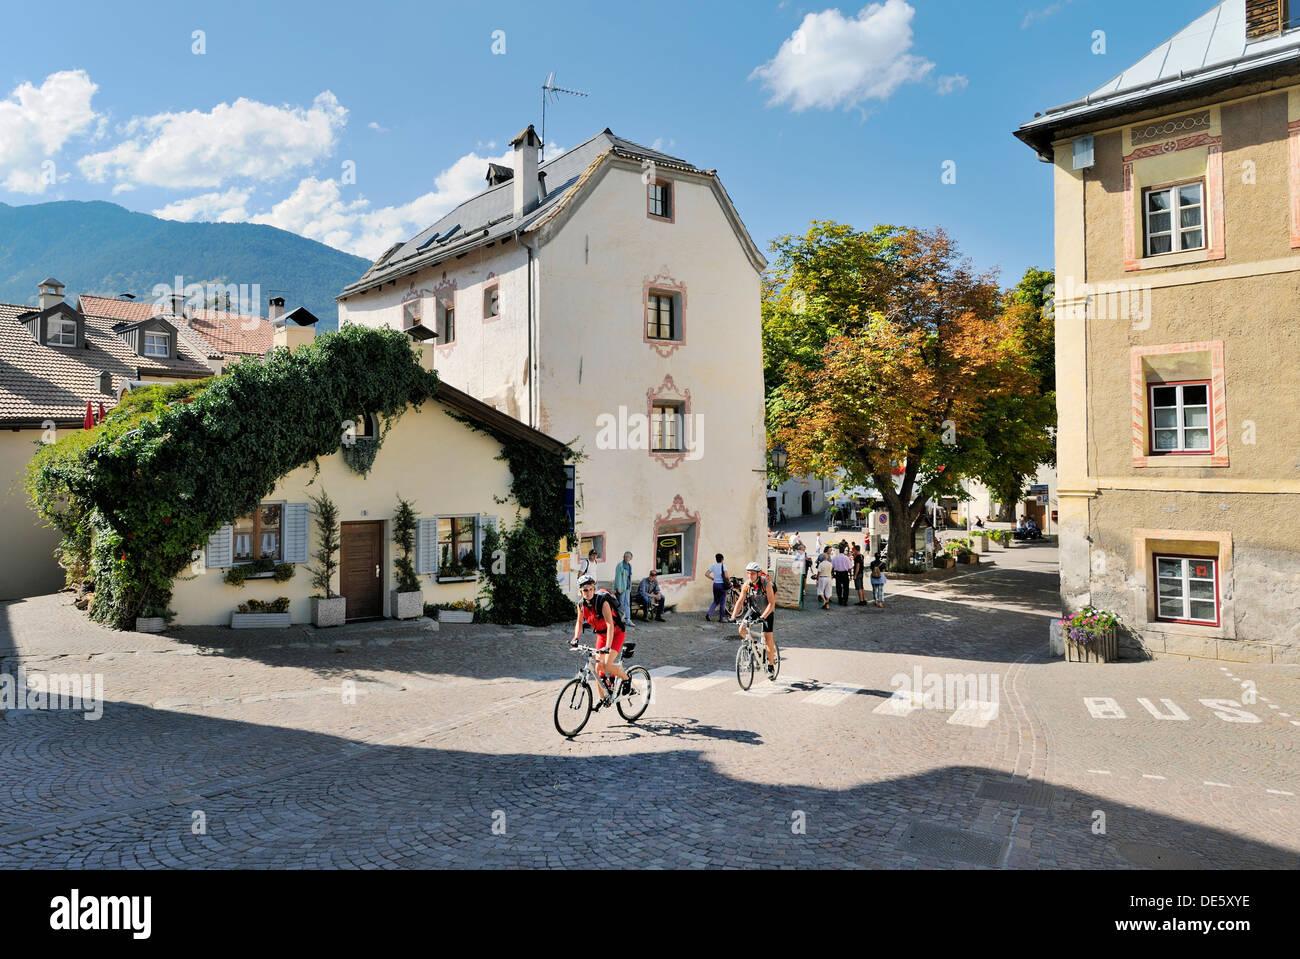 The centre of the Mediaeval walled town of Stadt Glurns, Glorenza, in the Val Venosta, Italian Alps. Alto Adige, Italy - Stock Image